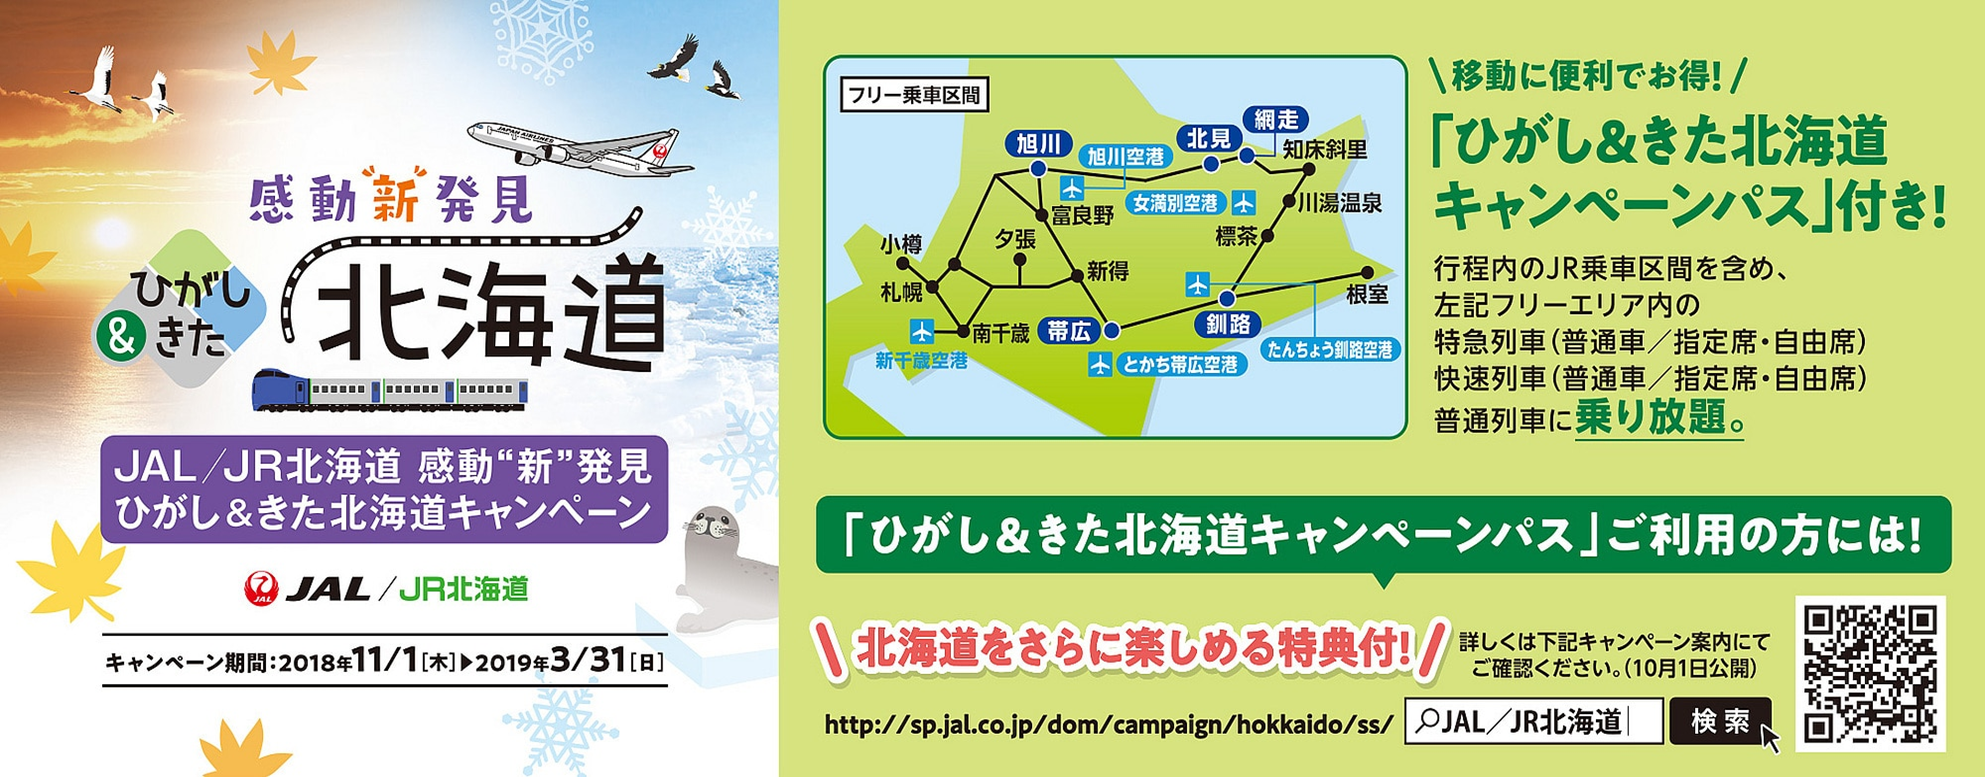 "JAL/JR北海道 感動""新""発見ひがし&きた北海道キャンペーン"